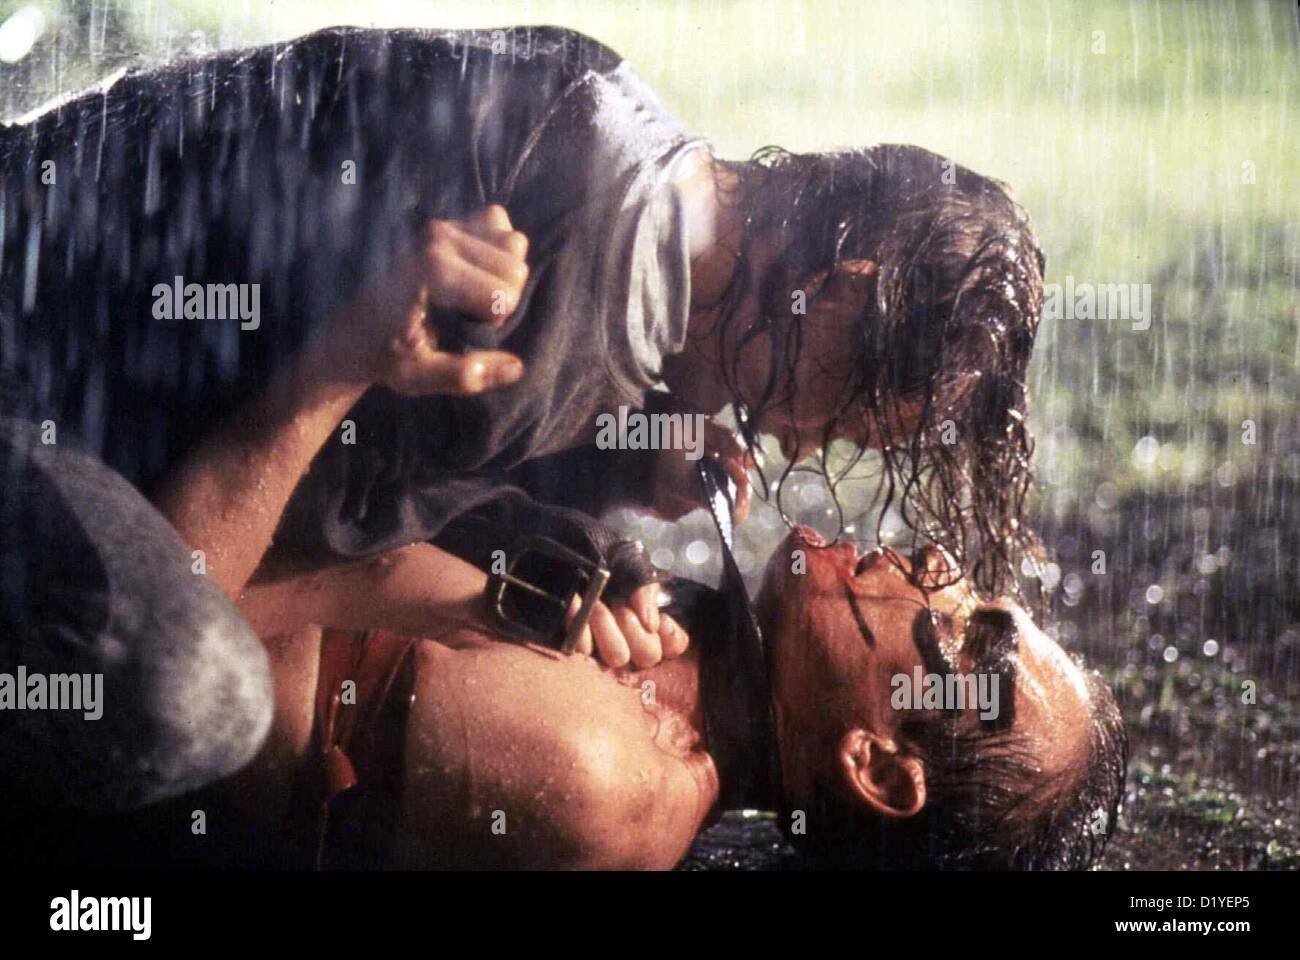 Der Fluch Des Dschungels   Last Gasp   Leslie Chase (Robert Patrick), Nora Weeks (Joanna Pacula) *** Local Caption - Stock Image